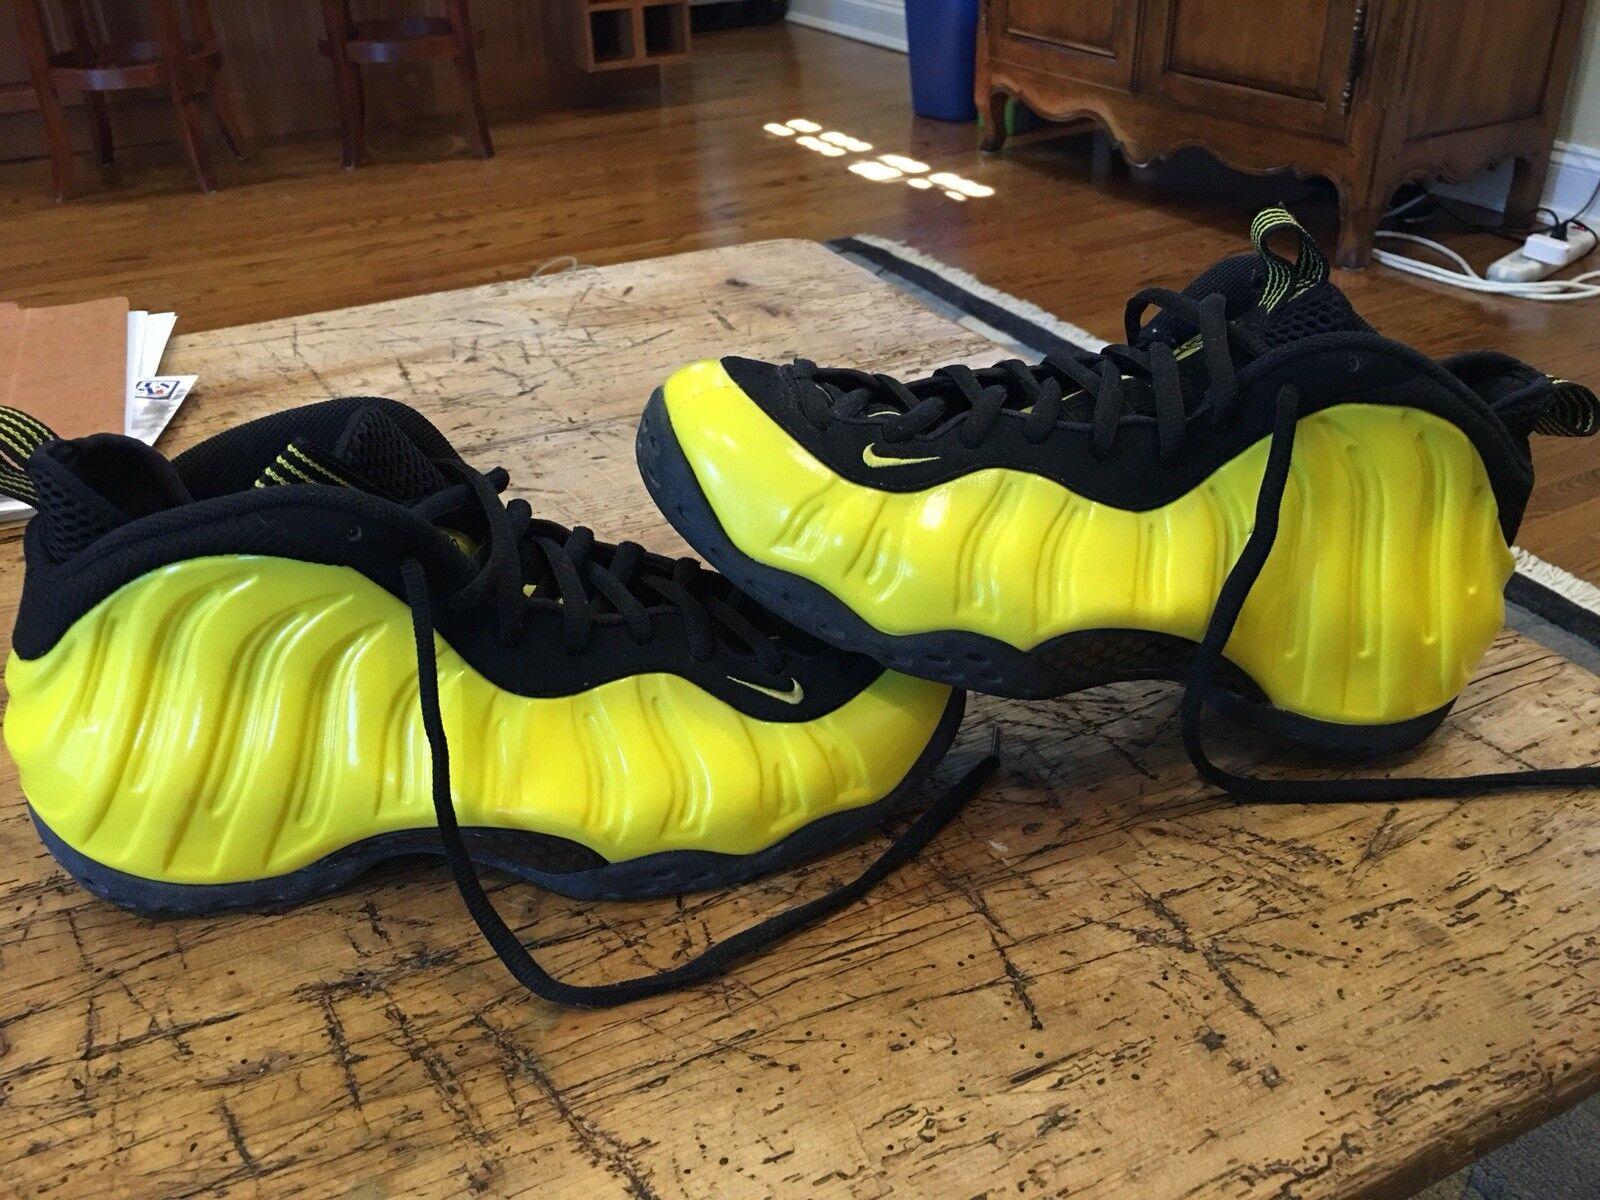 Nike Yellow Air Foamposite One Optic Yellow Nike Black Wu-Tang Clan Size 11 b35f91